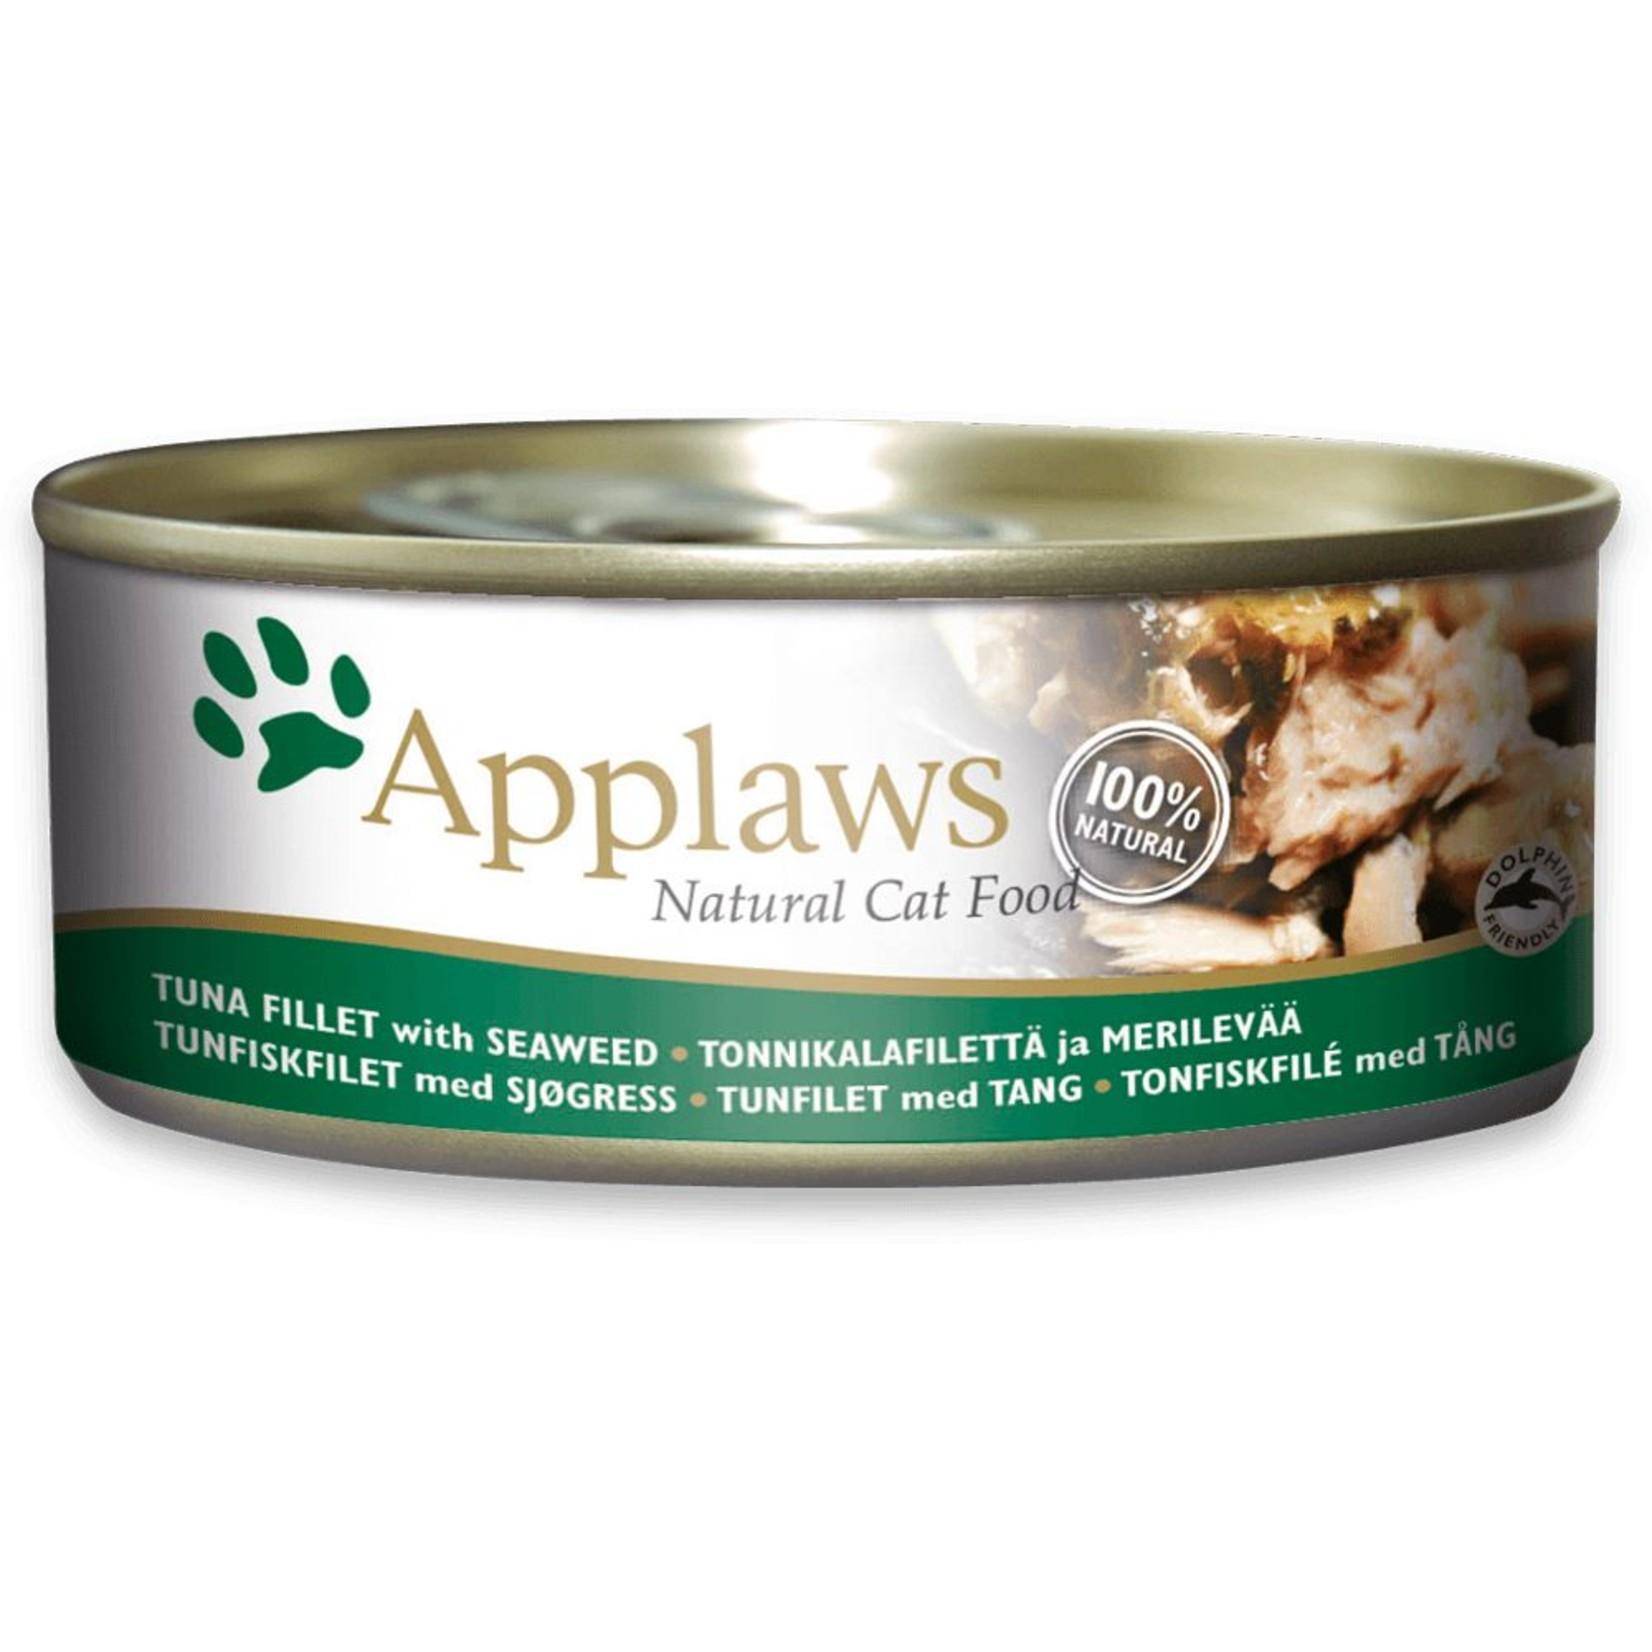 Applaws Cat Wet Food Tuna Fillet & Seaweed, 156g